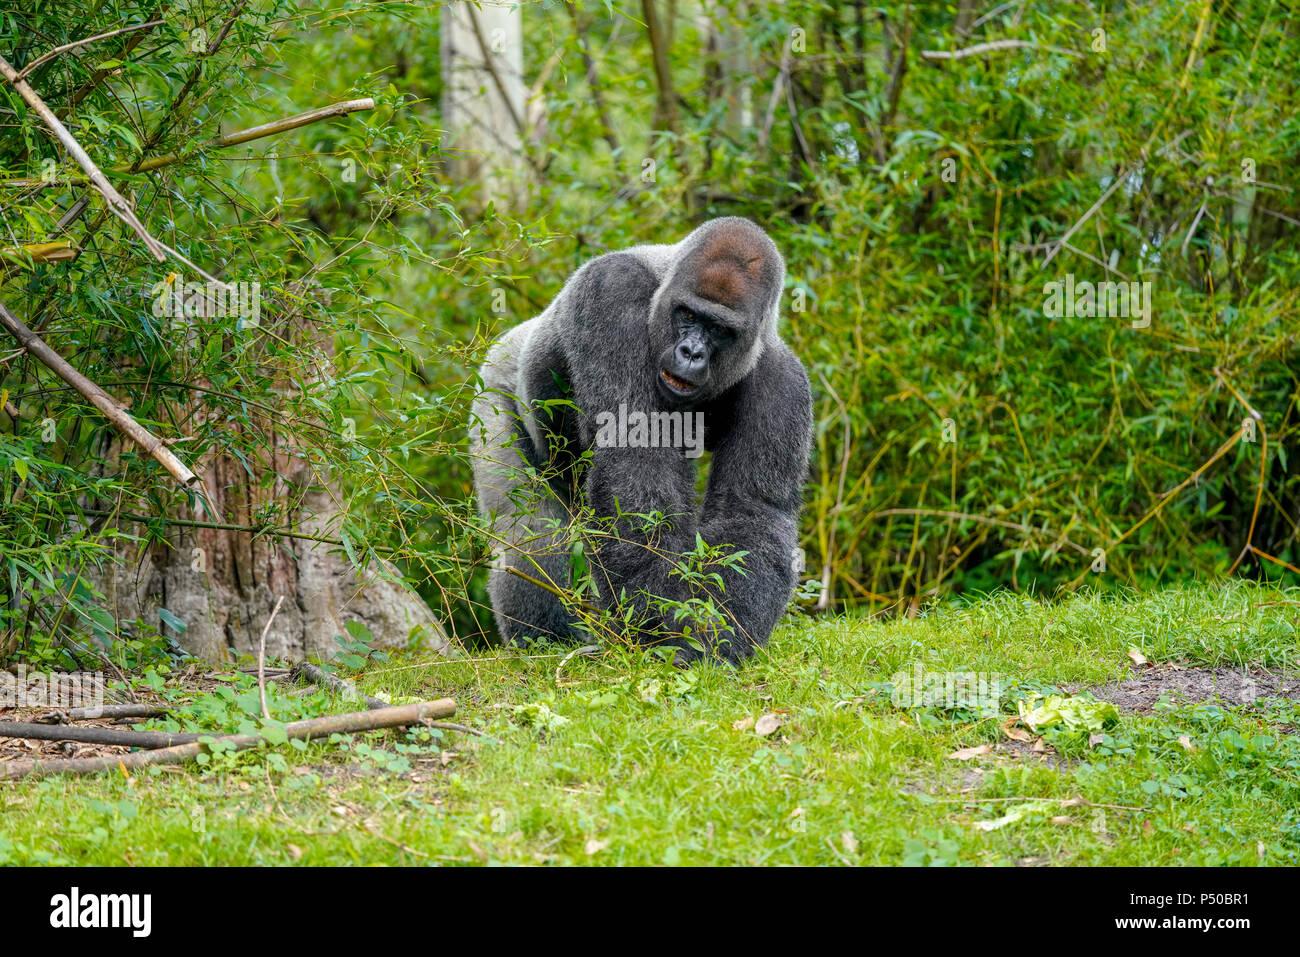 Image of: Orlando Gorilla Kilimanjaro Safaris Is Safari Attraction At Disneys Animal Kingdom On The Walt Disney World Resort Property In Lake Buena Vista Florida Alamy Gorilla Kilimanjaro Safaris Is Safari Attraction At Disneys